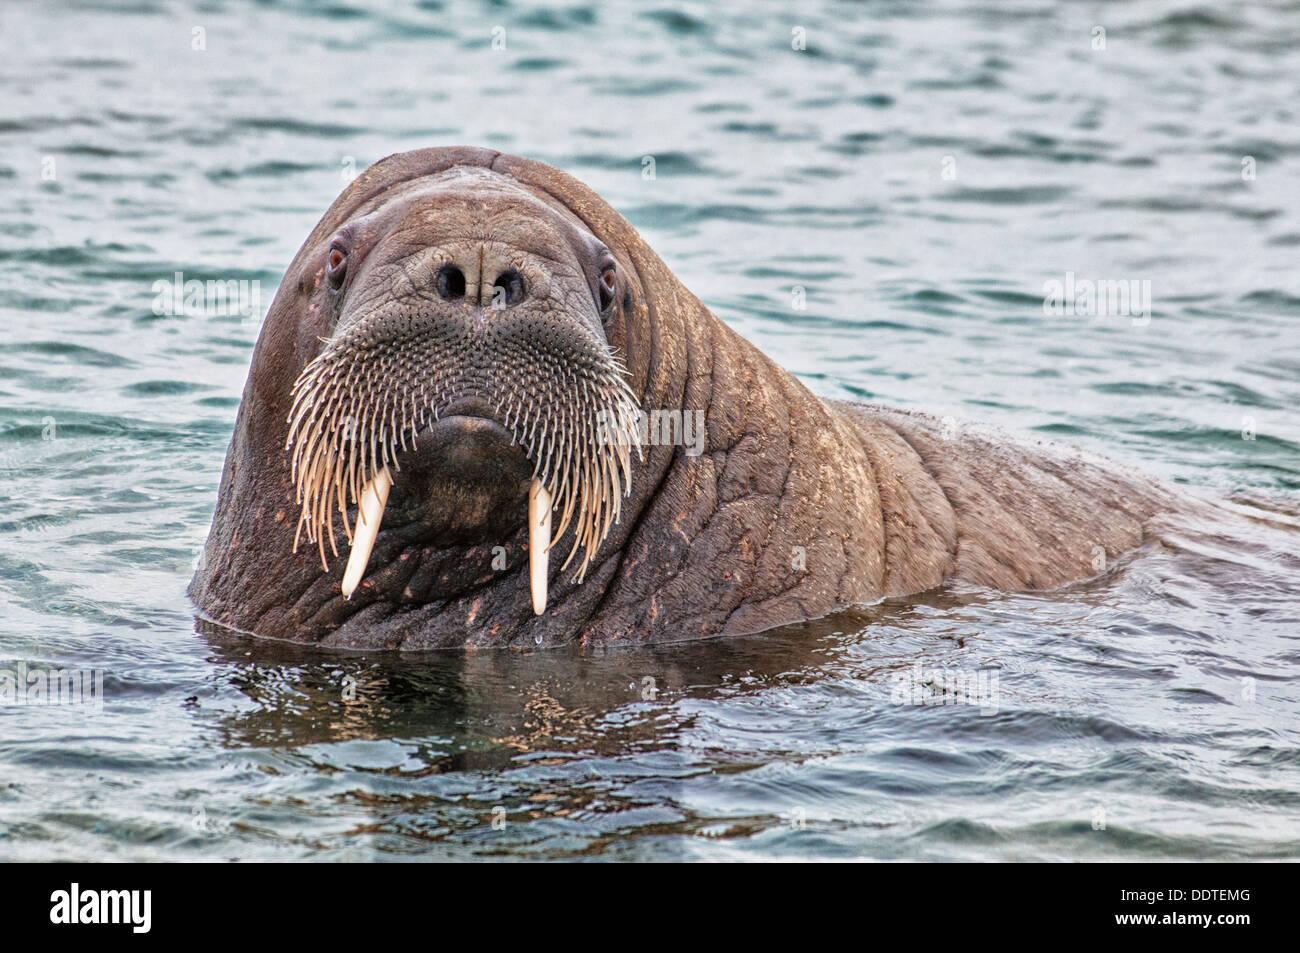 Close Up of a Walrus, Odobenus rosmarus, in the water, Torelineset, Svalbard Archipelago, Arctic Norway Stock Photo